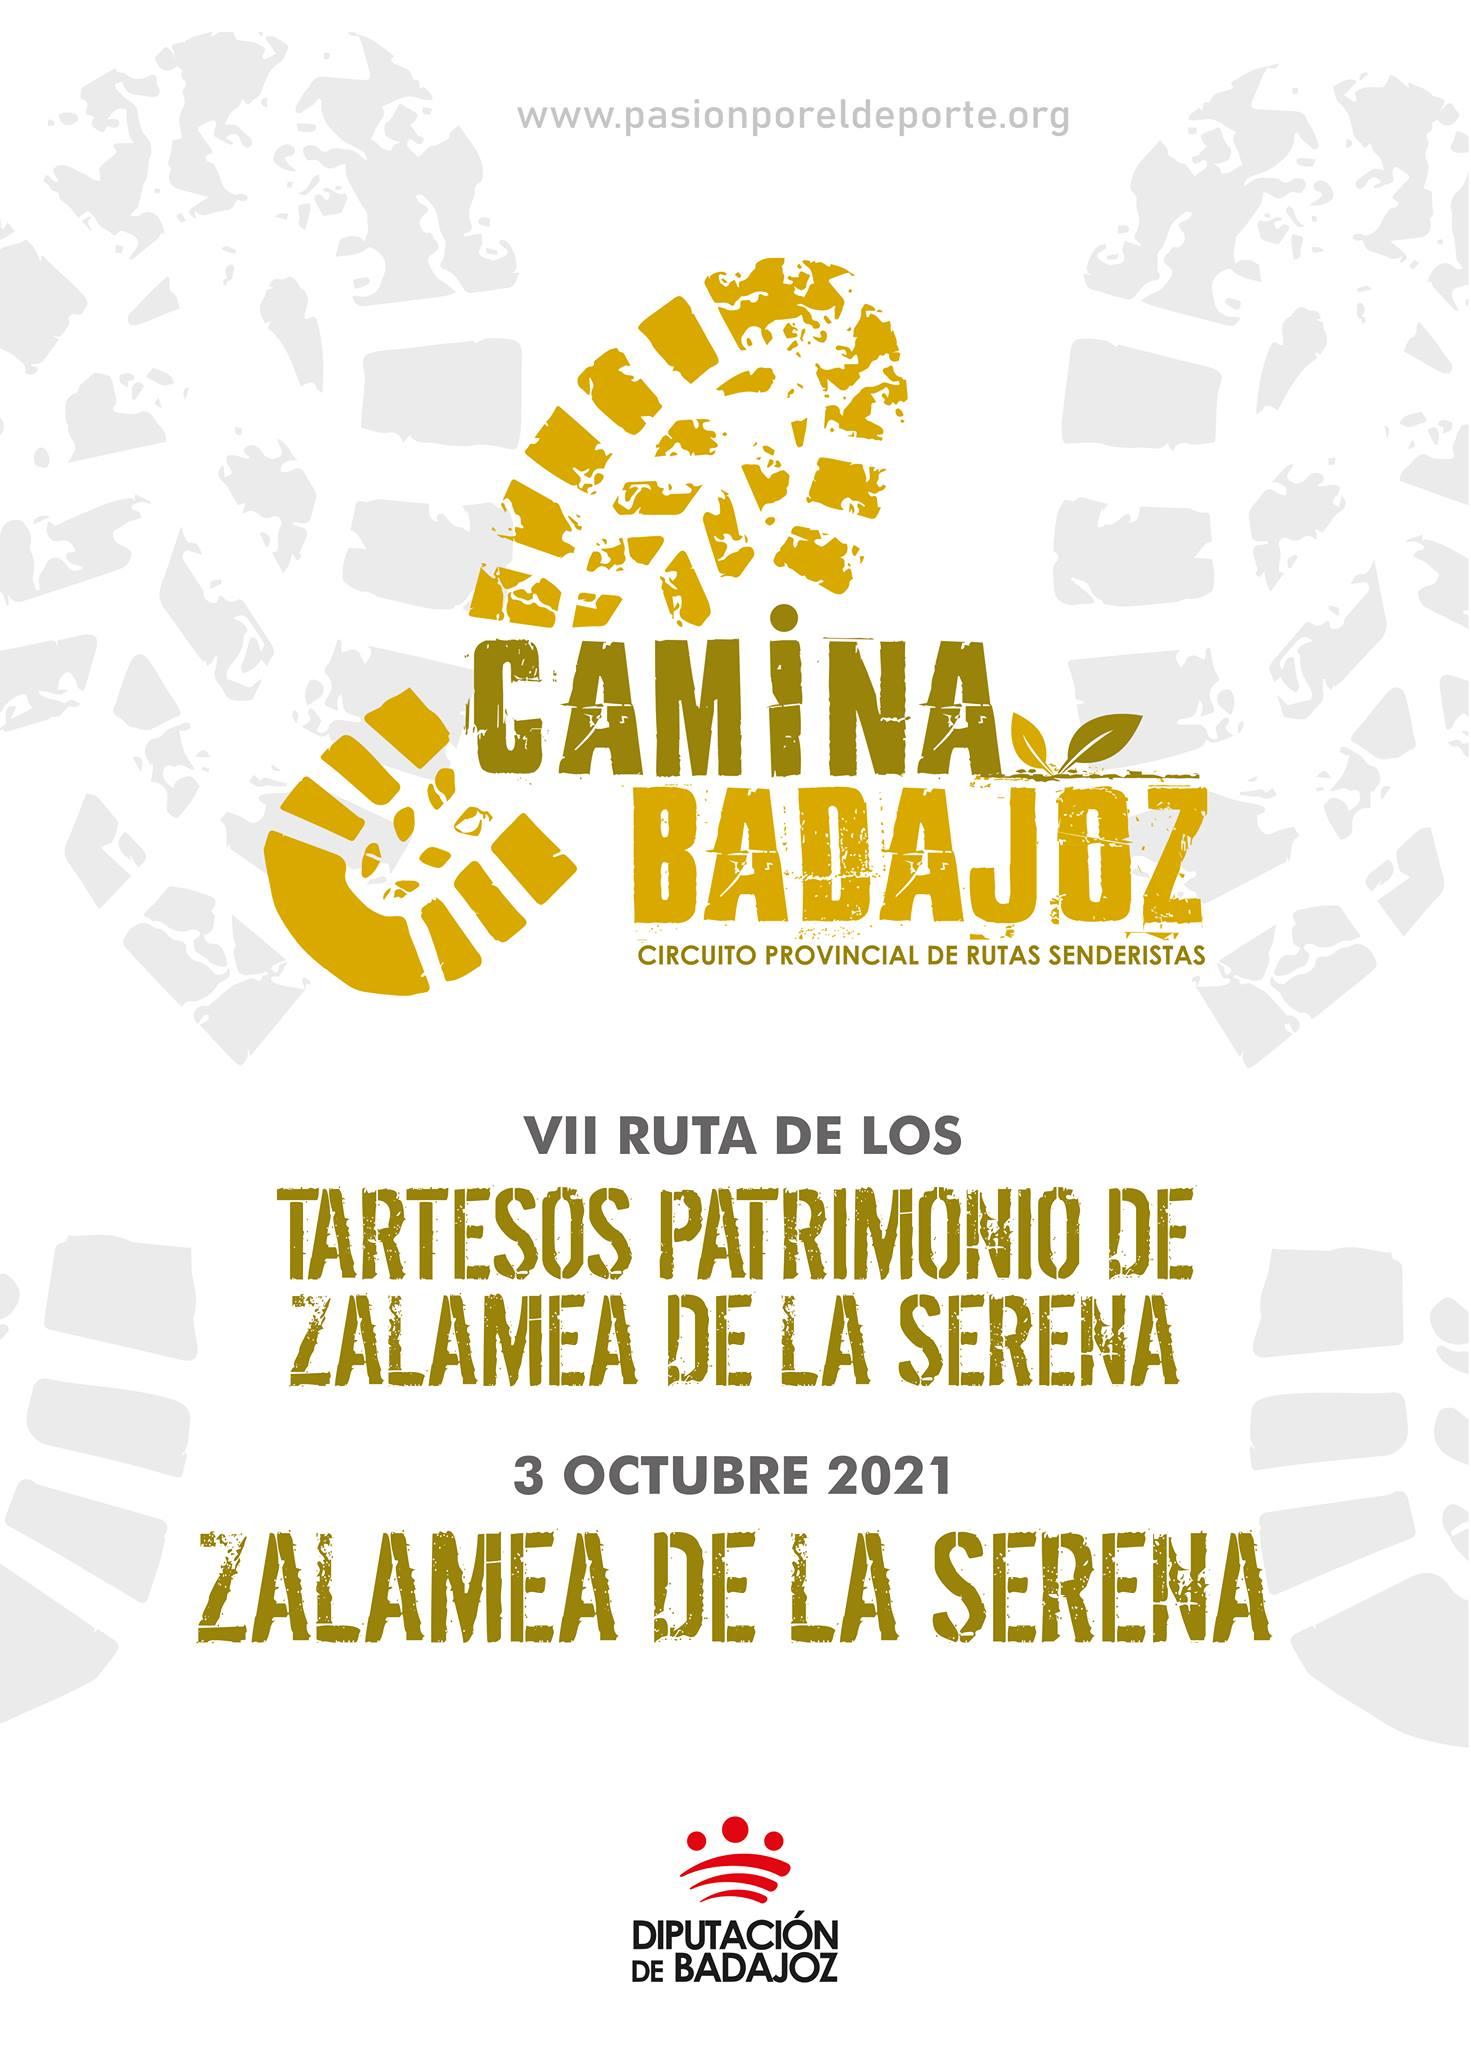 CAMINA BADAJOZ | VII Ruta de los tartesos (Zalamea de la Serena)